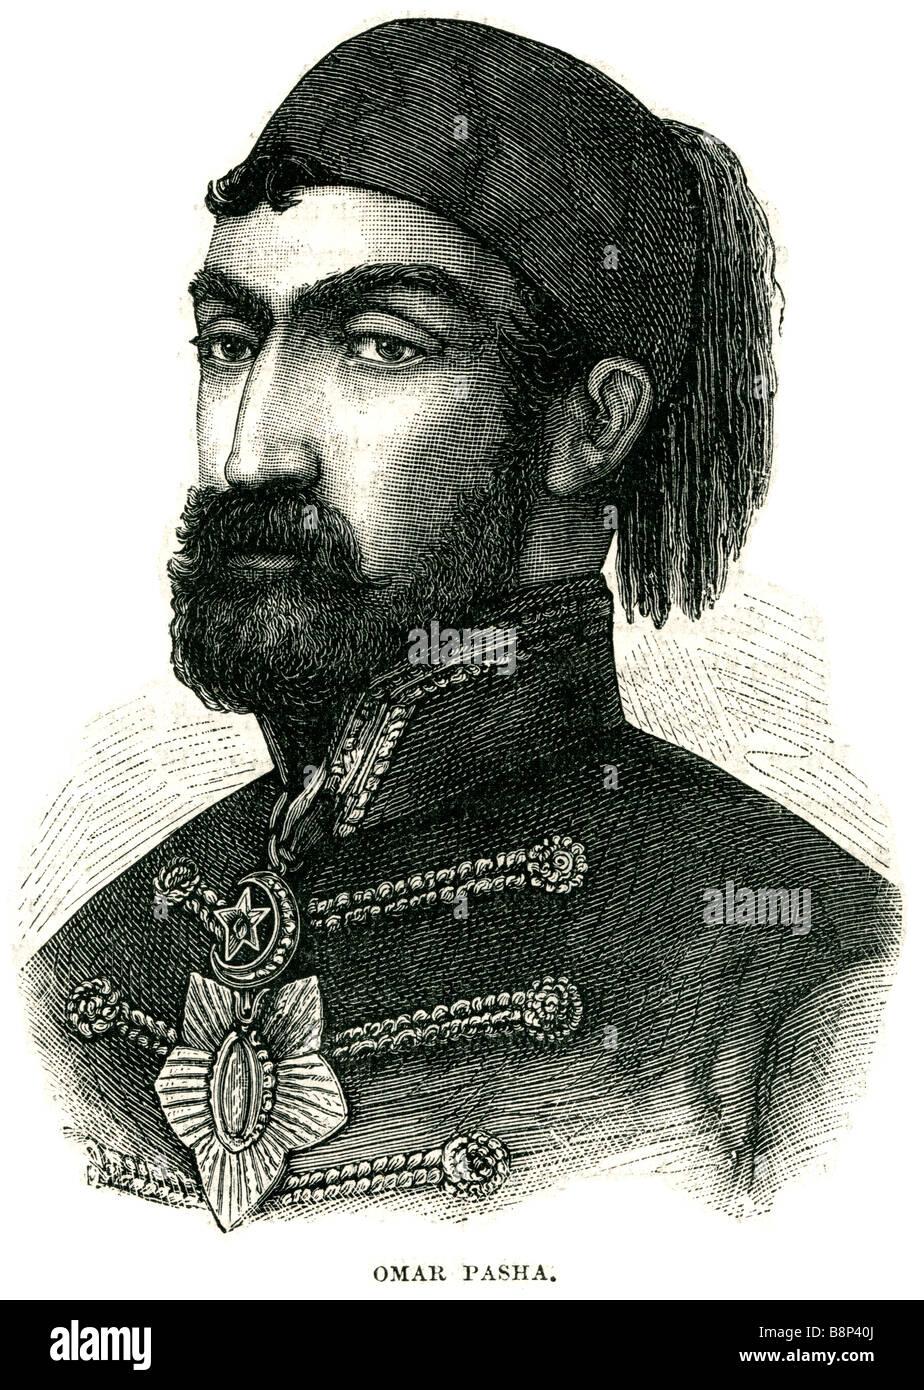 Omar Pasha Latas 1806 71 General Otomano Kraina Serbia Serbia Janja Gora Foto de stock